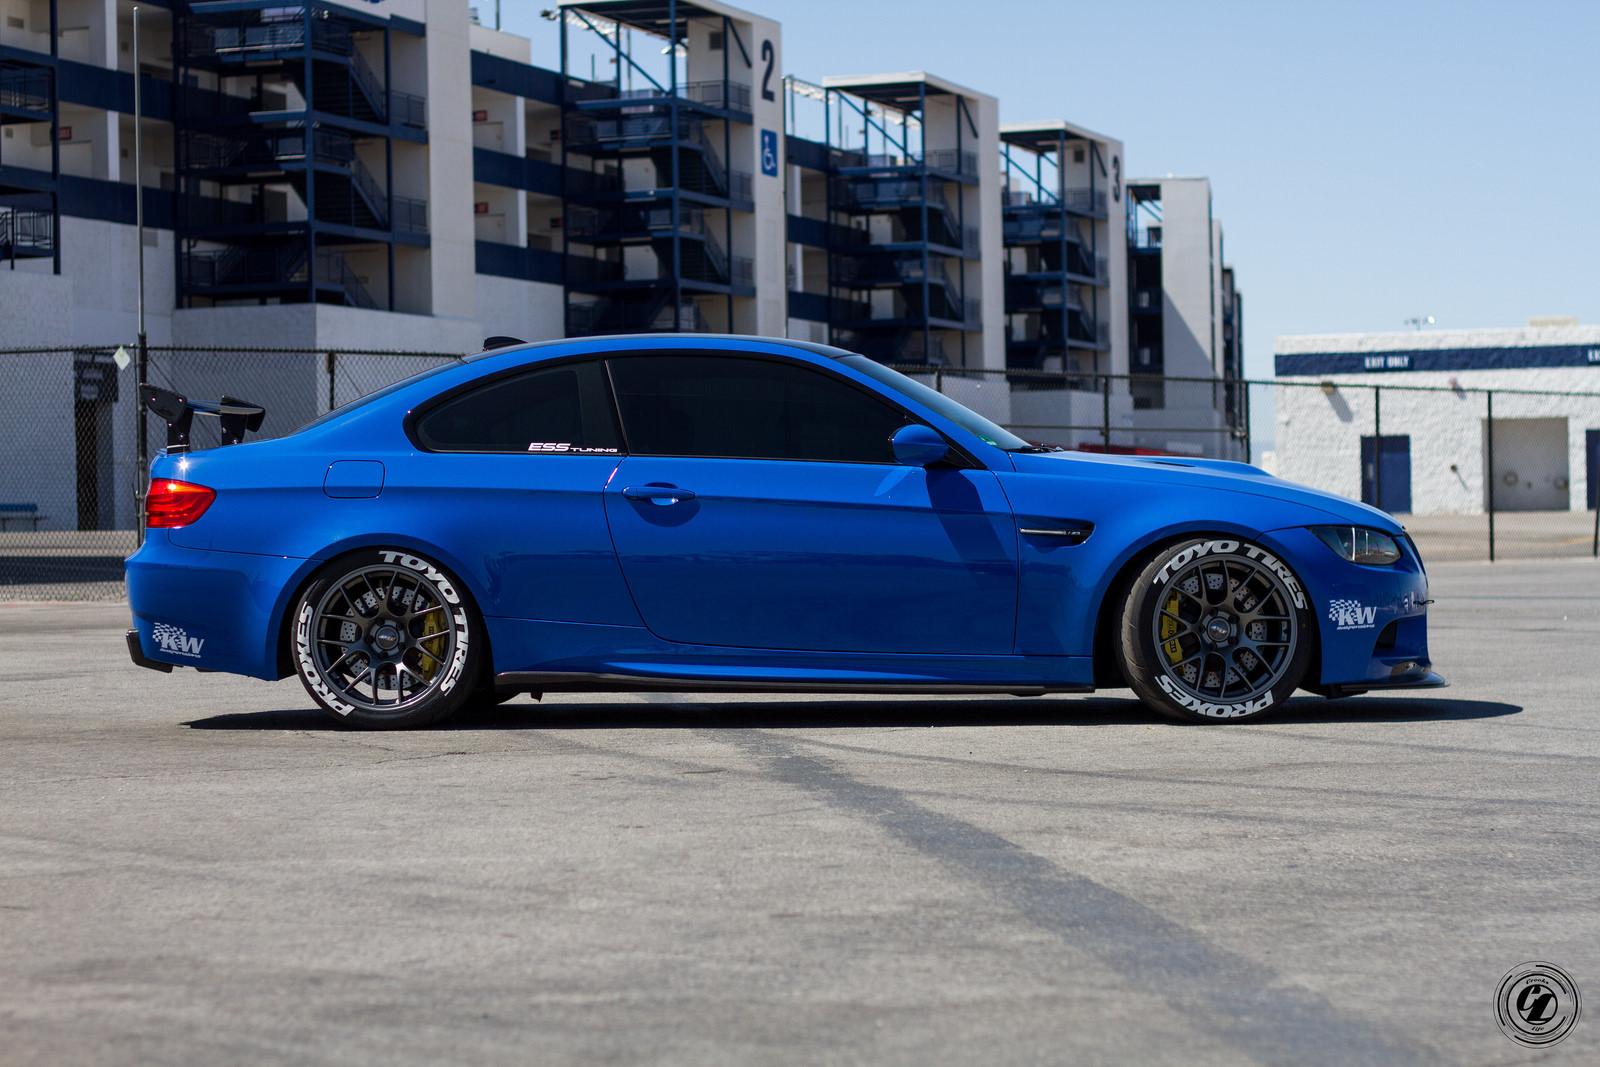 Santorini Blue BMW E92 M3 Is Here to Take You Down - autoevolution